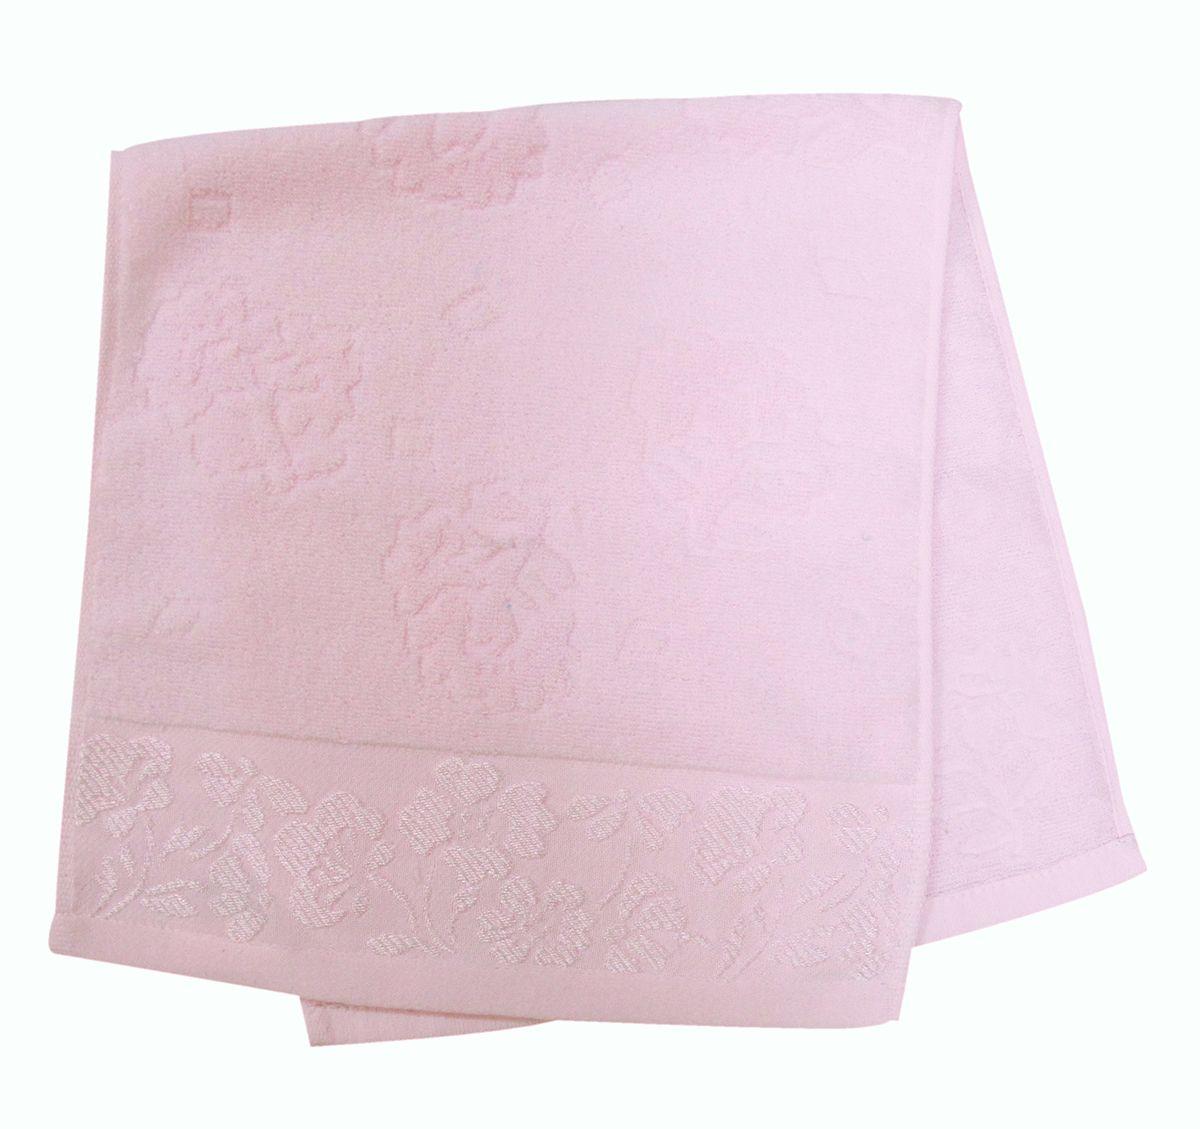 Полотенце махровое НВ Ромашка, цвет: розовый, 33 х 70 см. м0177_0240707